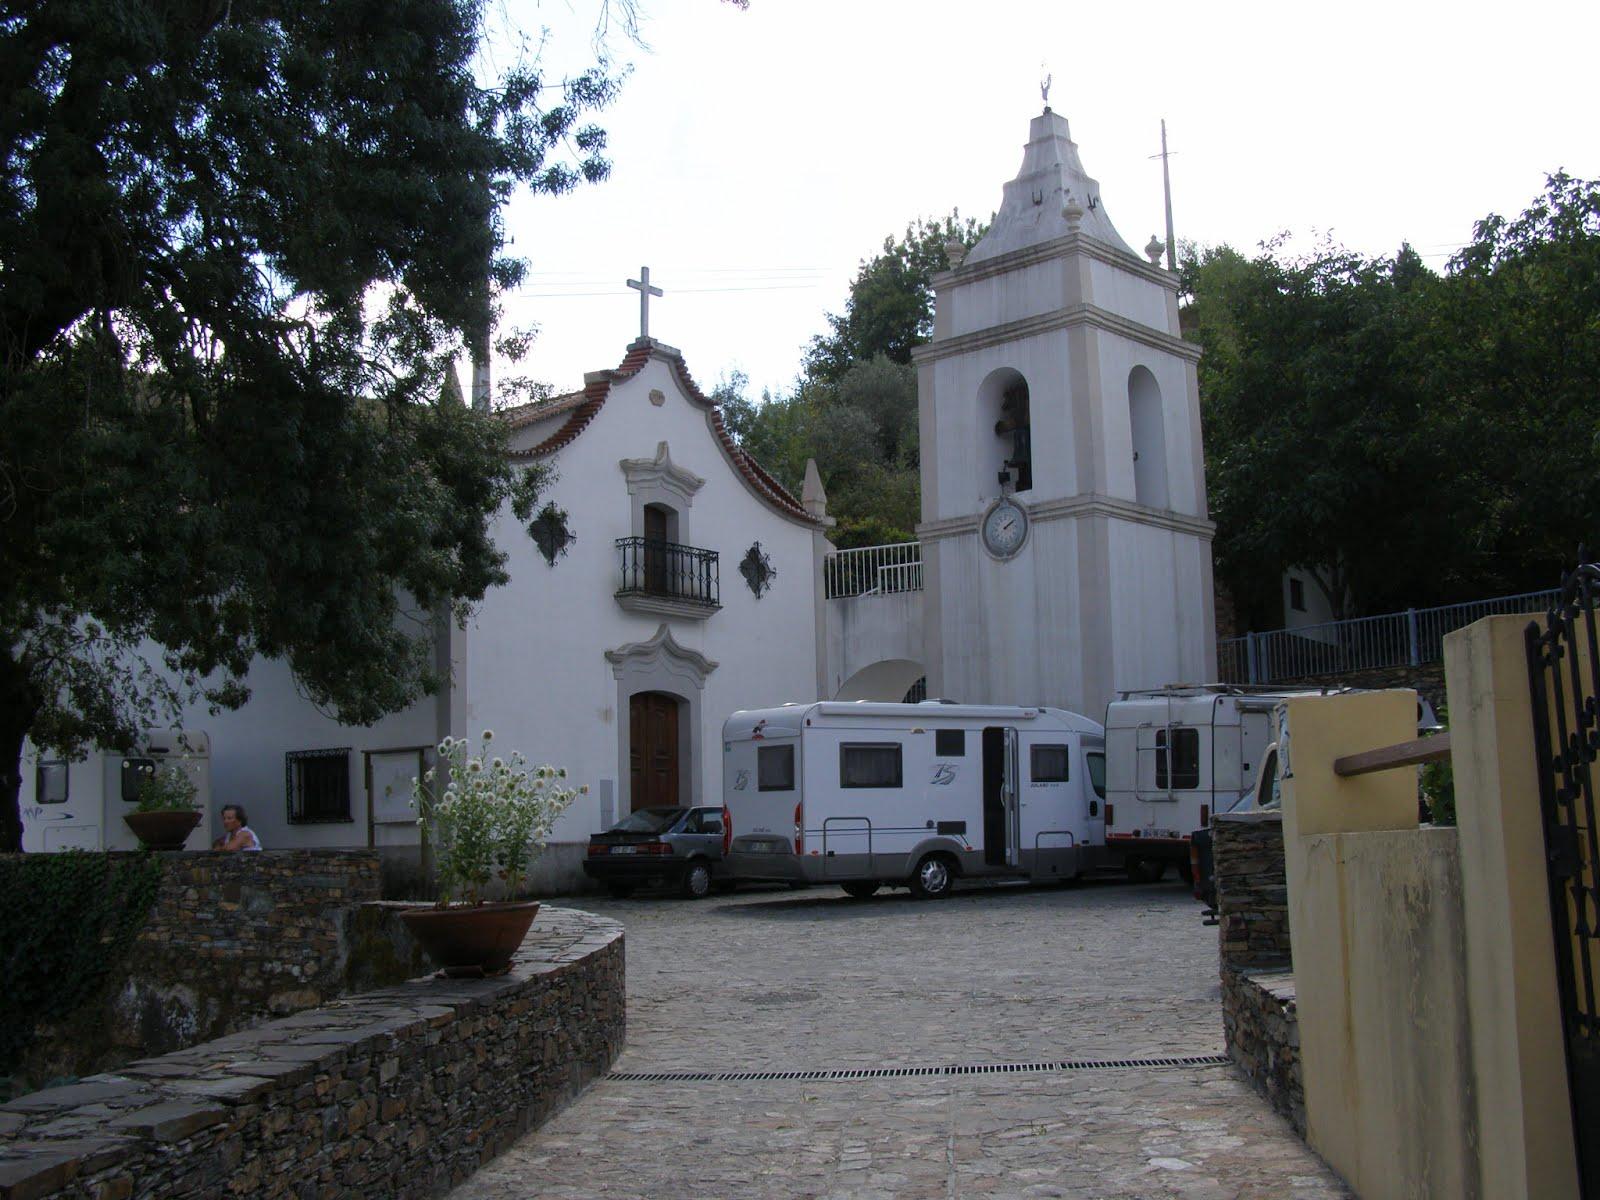 Procuro Nda De Bilbau Pampilhosa Da Serra-8812